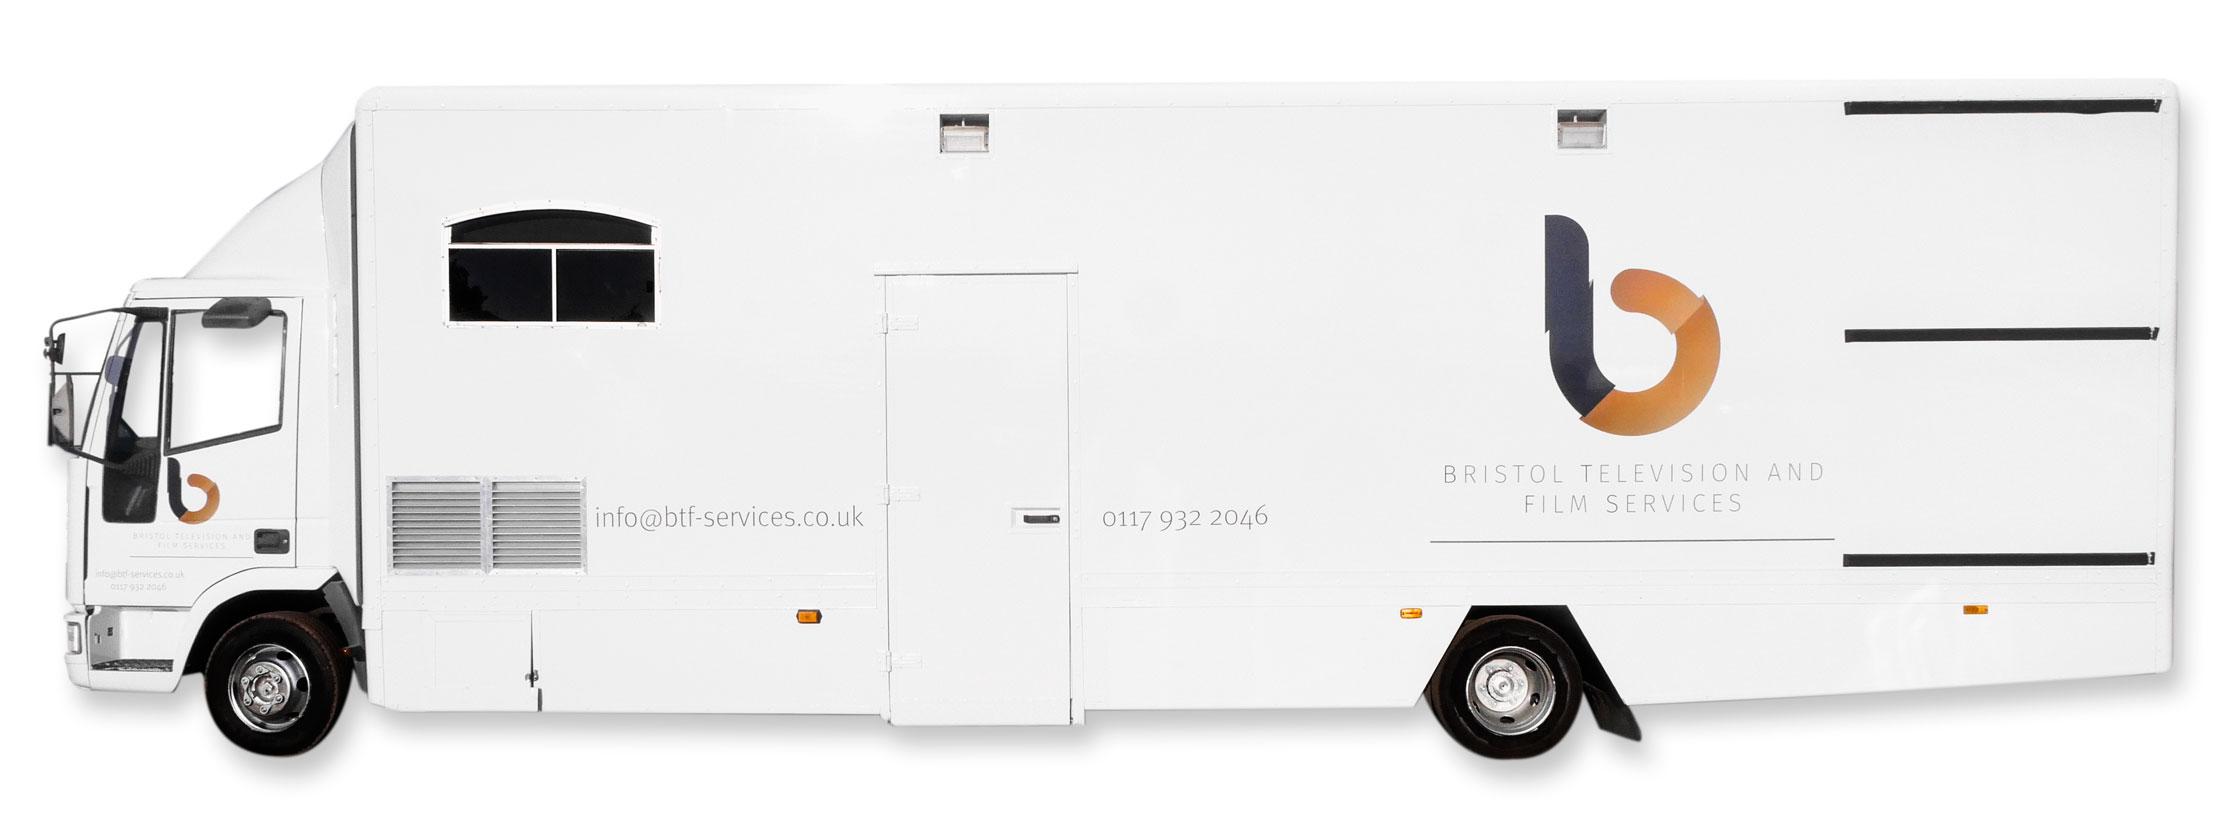 P1230446.jpg